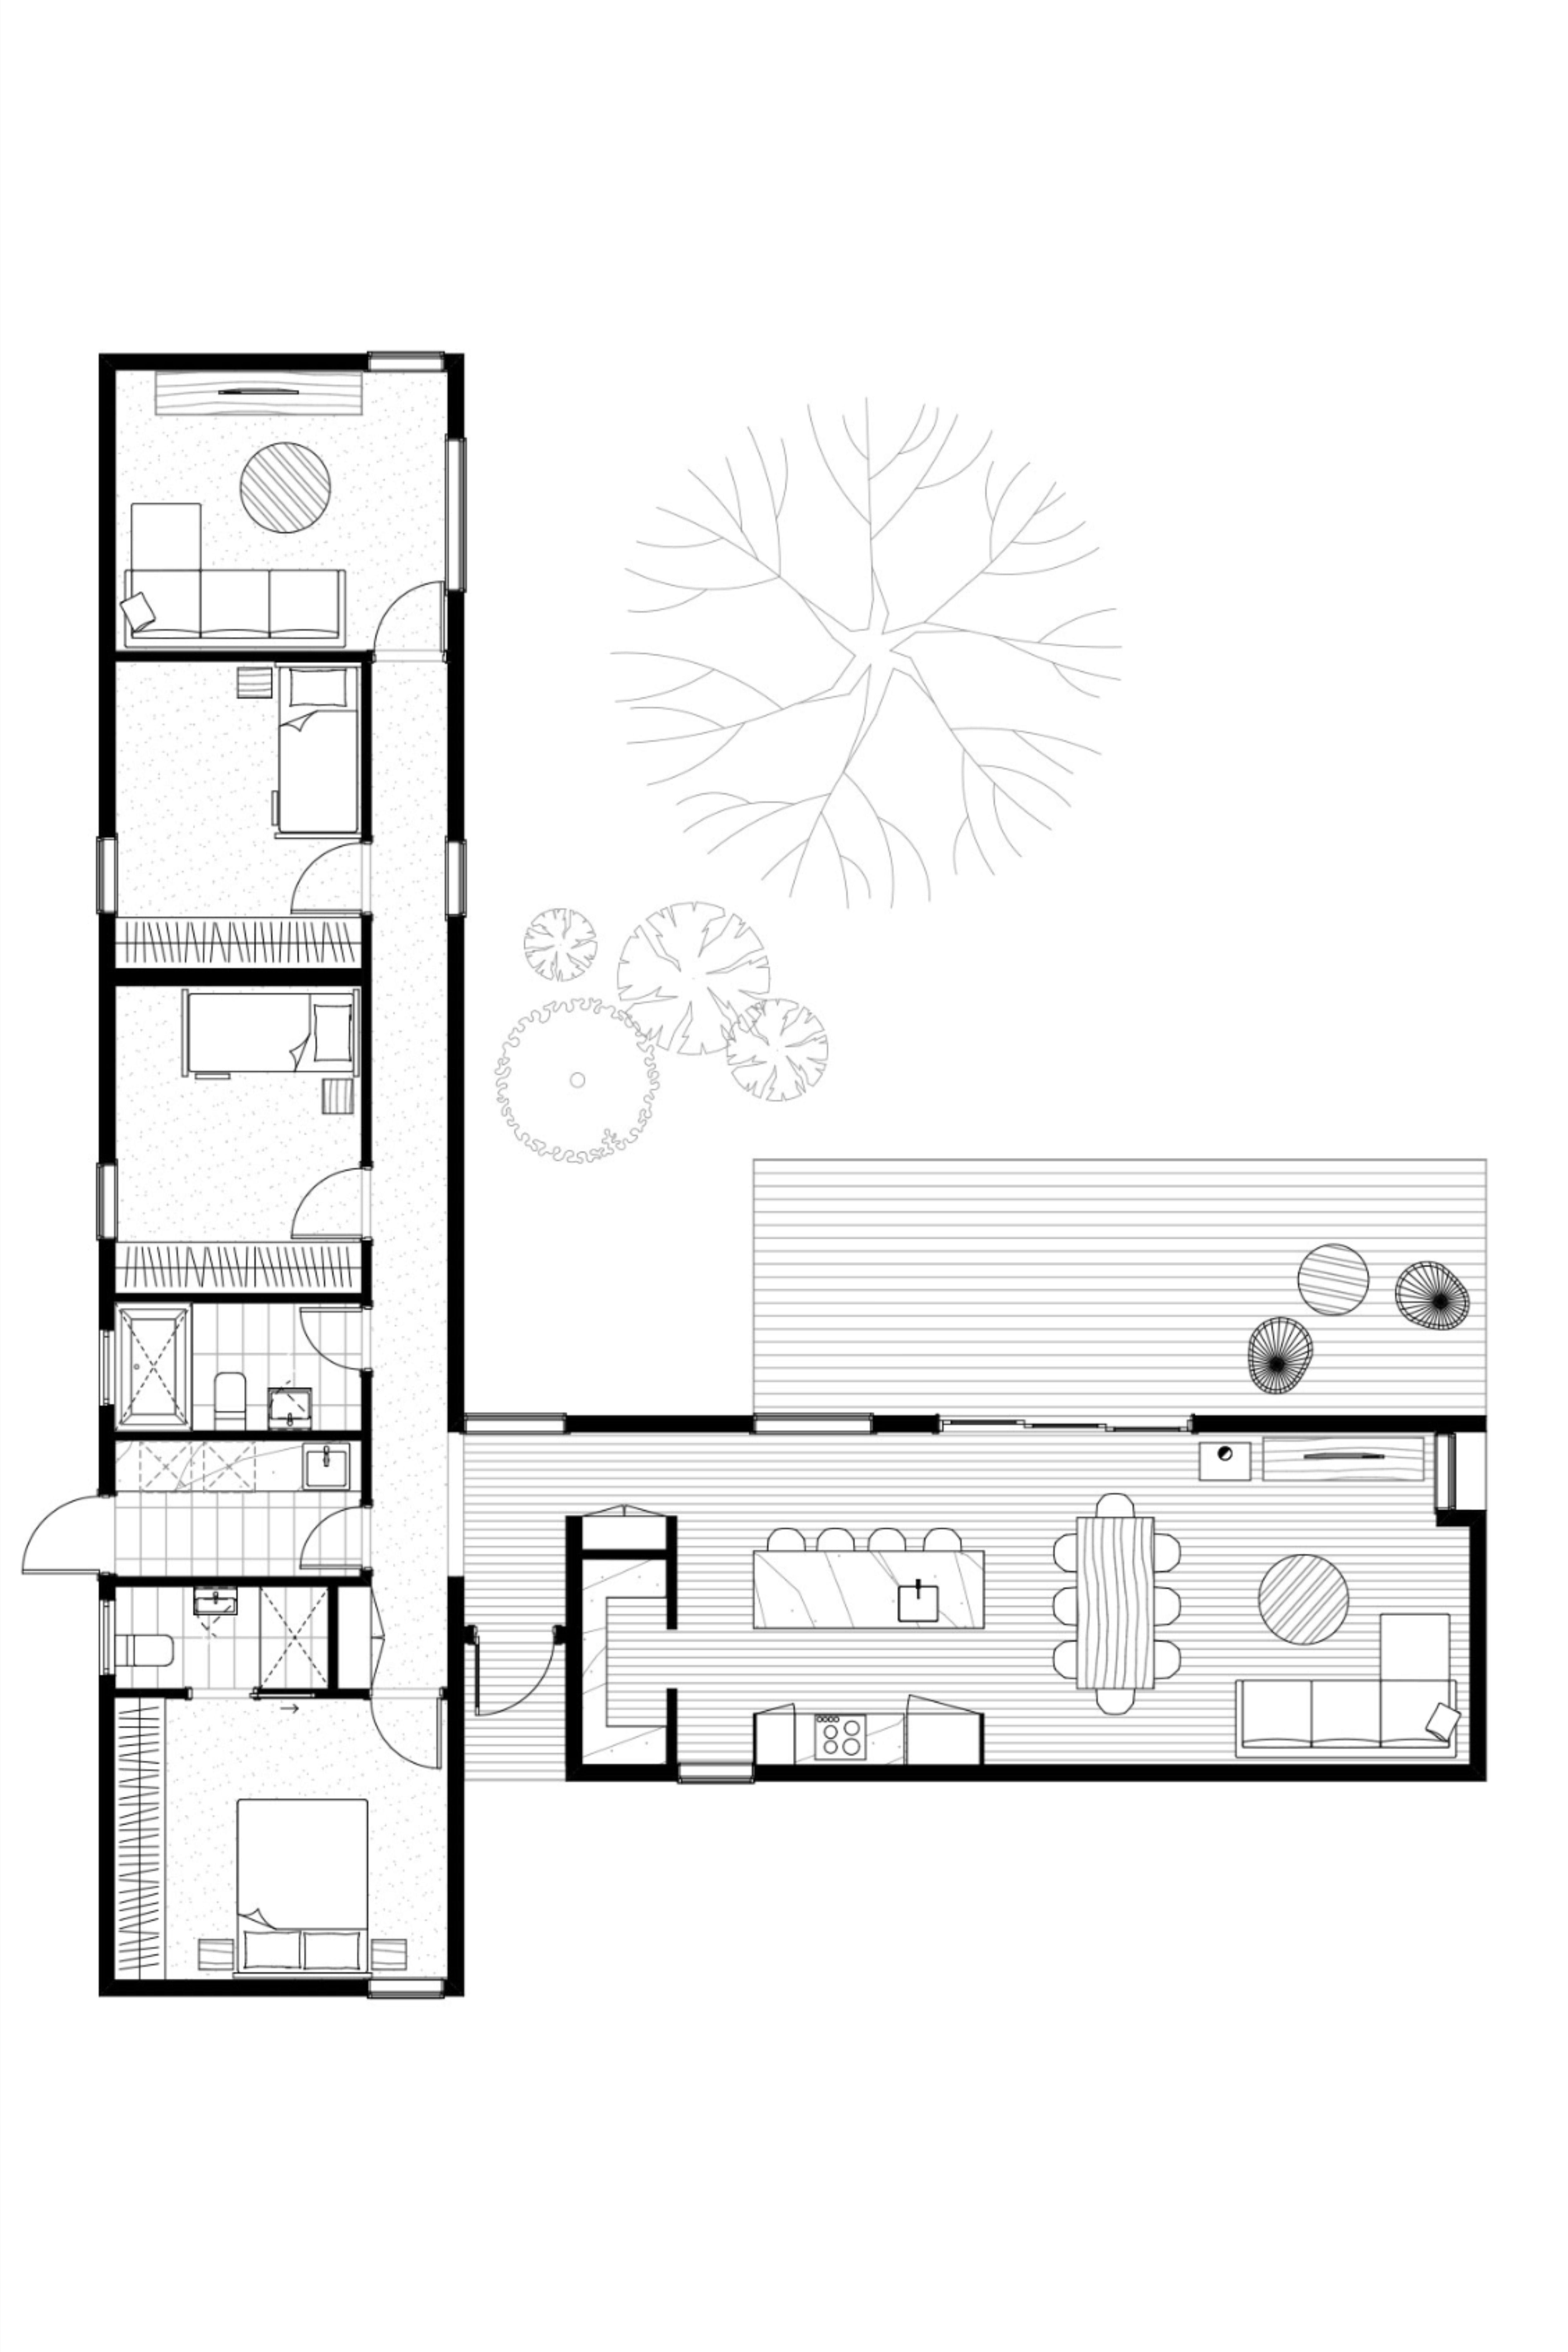 A Modern T Shape Floor Plan Your Family Will Love For Life Bathroomlaundry The Archiblox Axe Floor Plan Design Architectural Floor Plans L Shaped House Plans